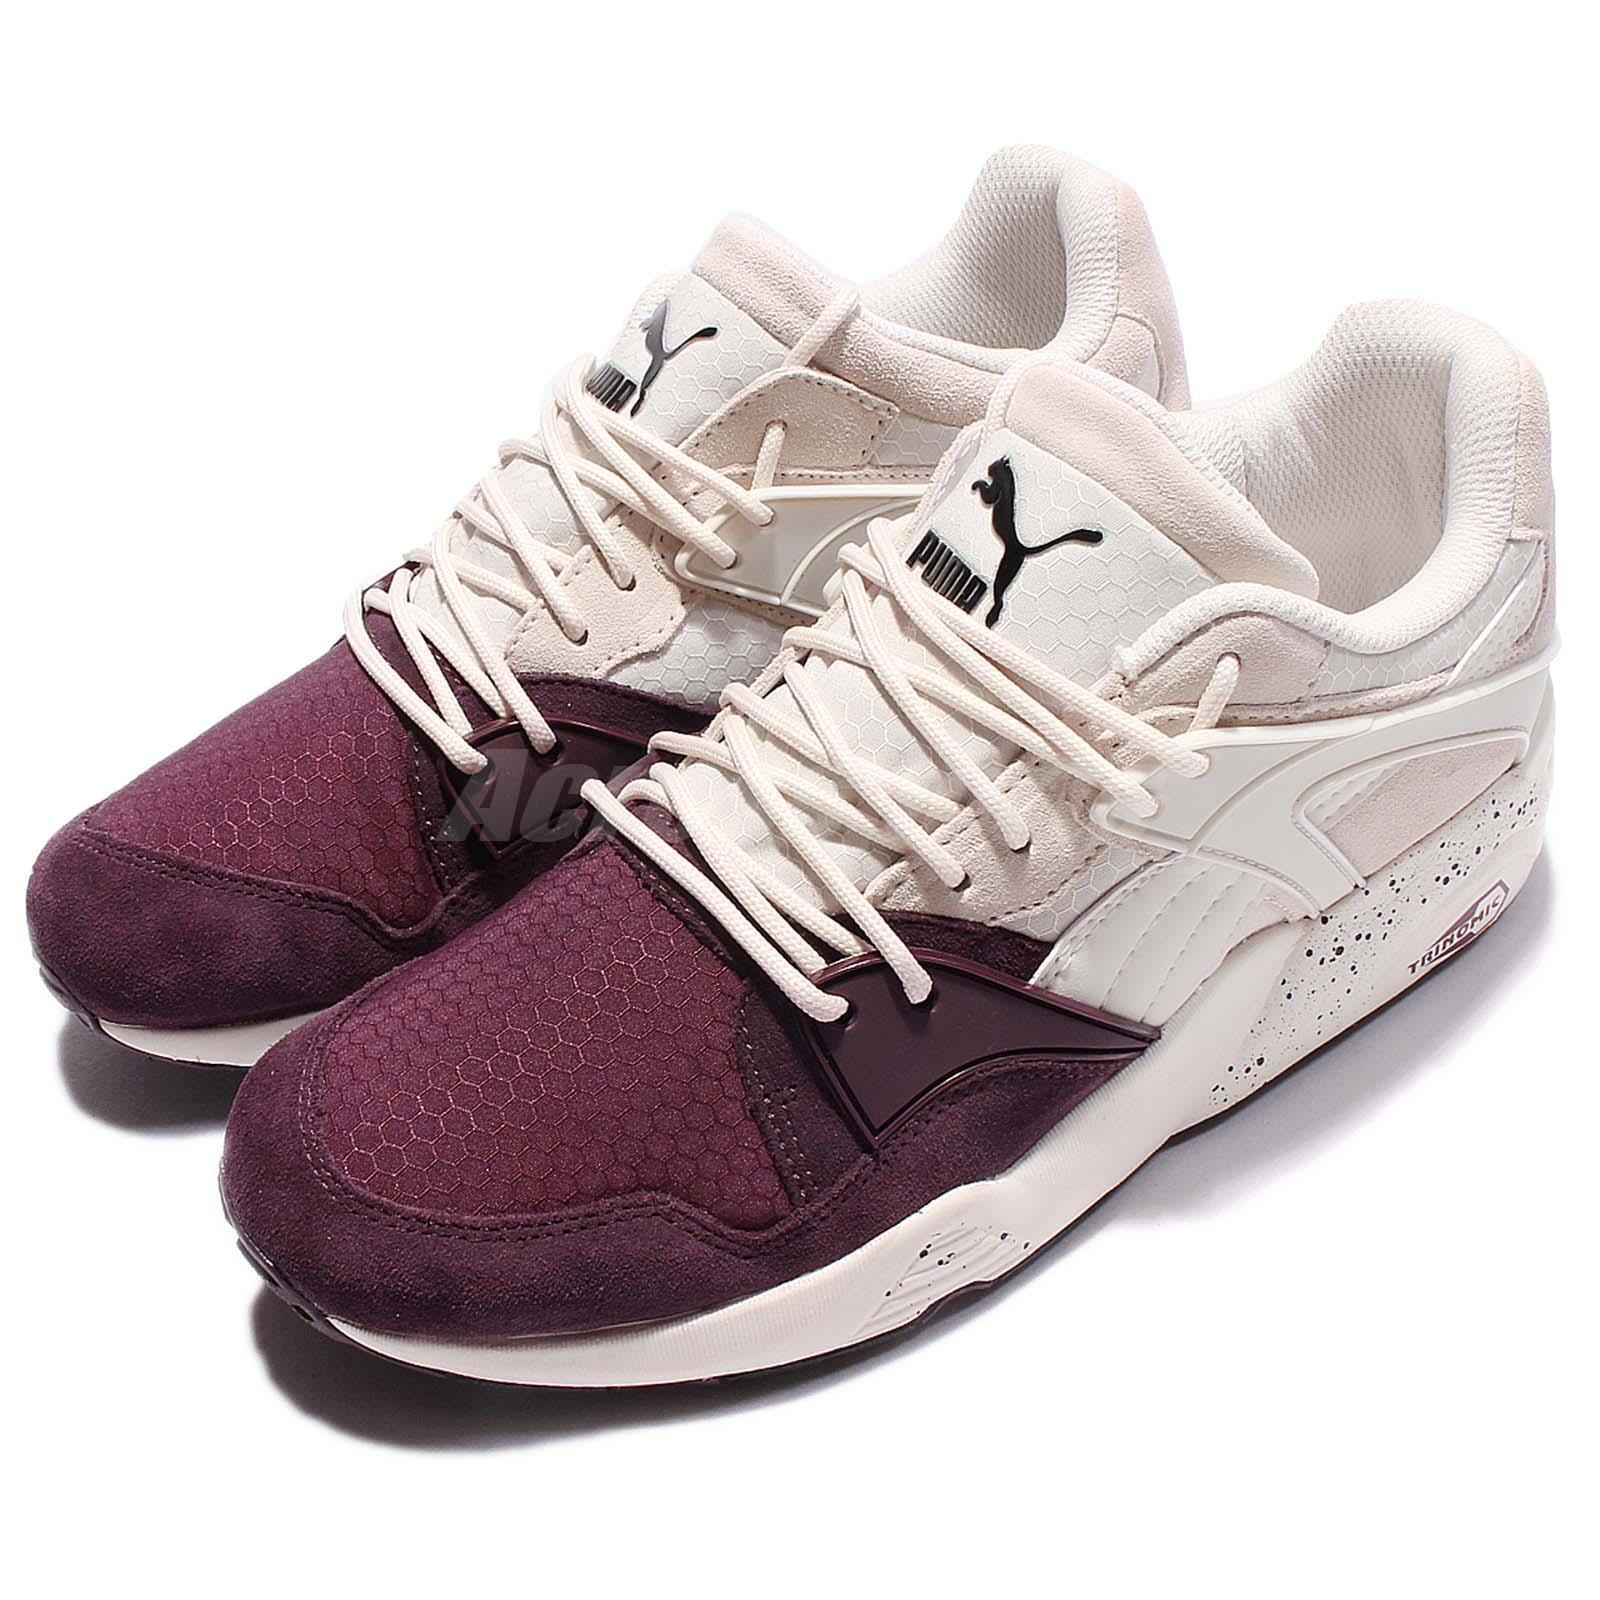 Puma Trinomic Blaze Winter Tech Trainers White Purple Men Running shoes 361341-03